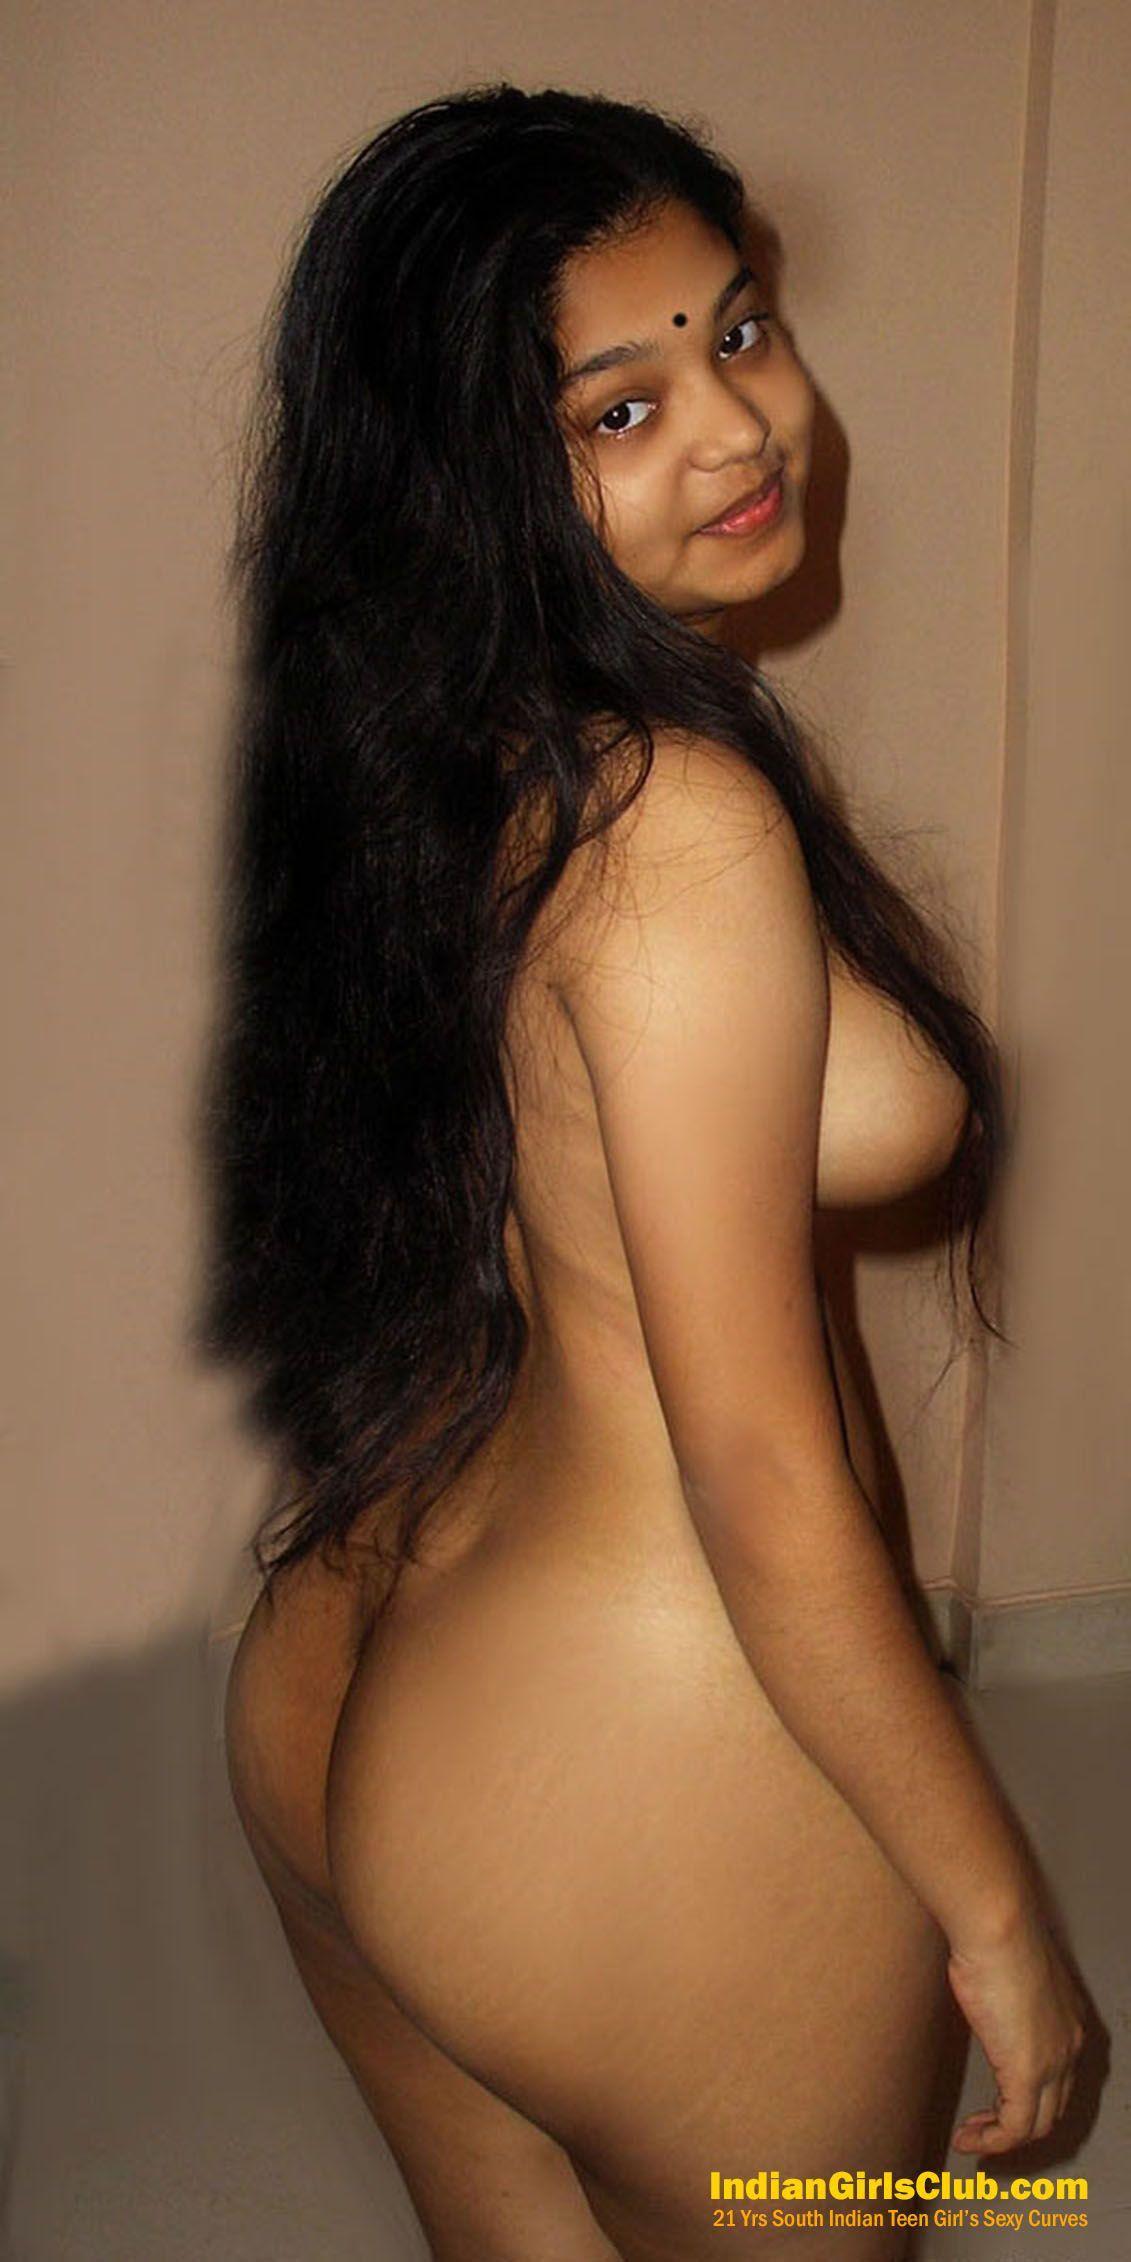 Ladies nude indian Indian